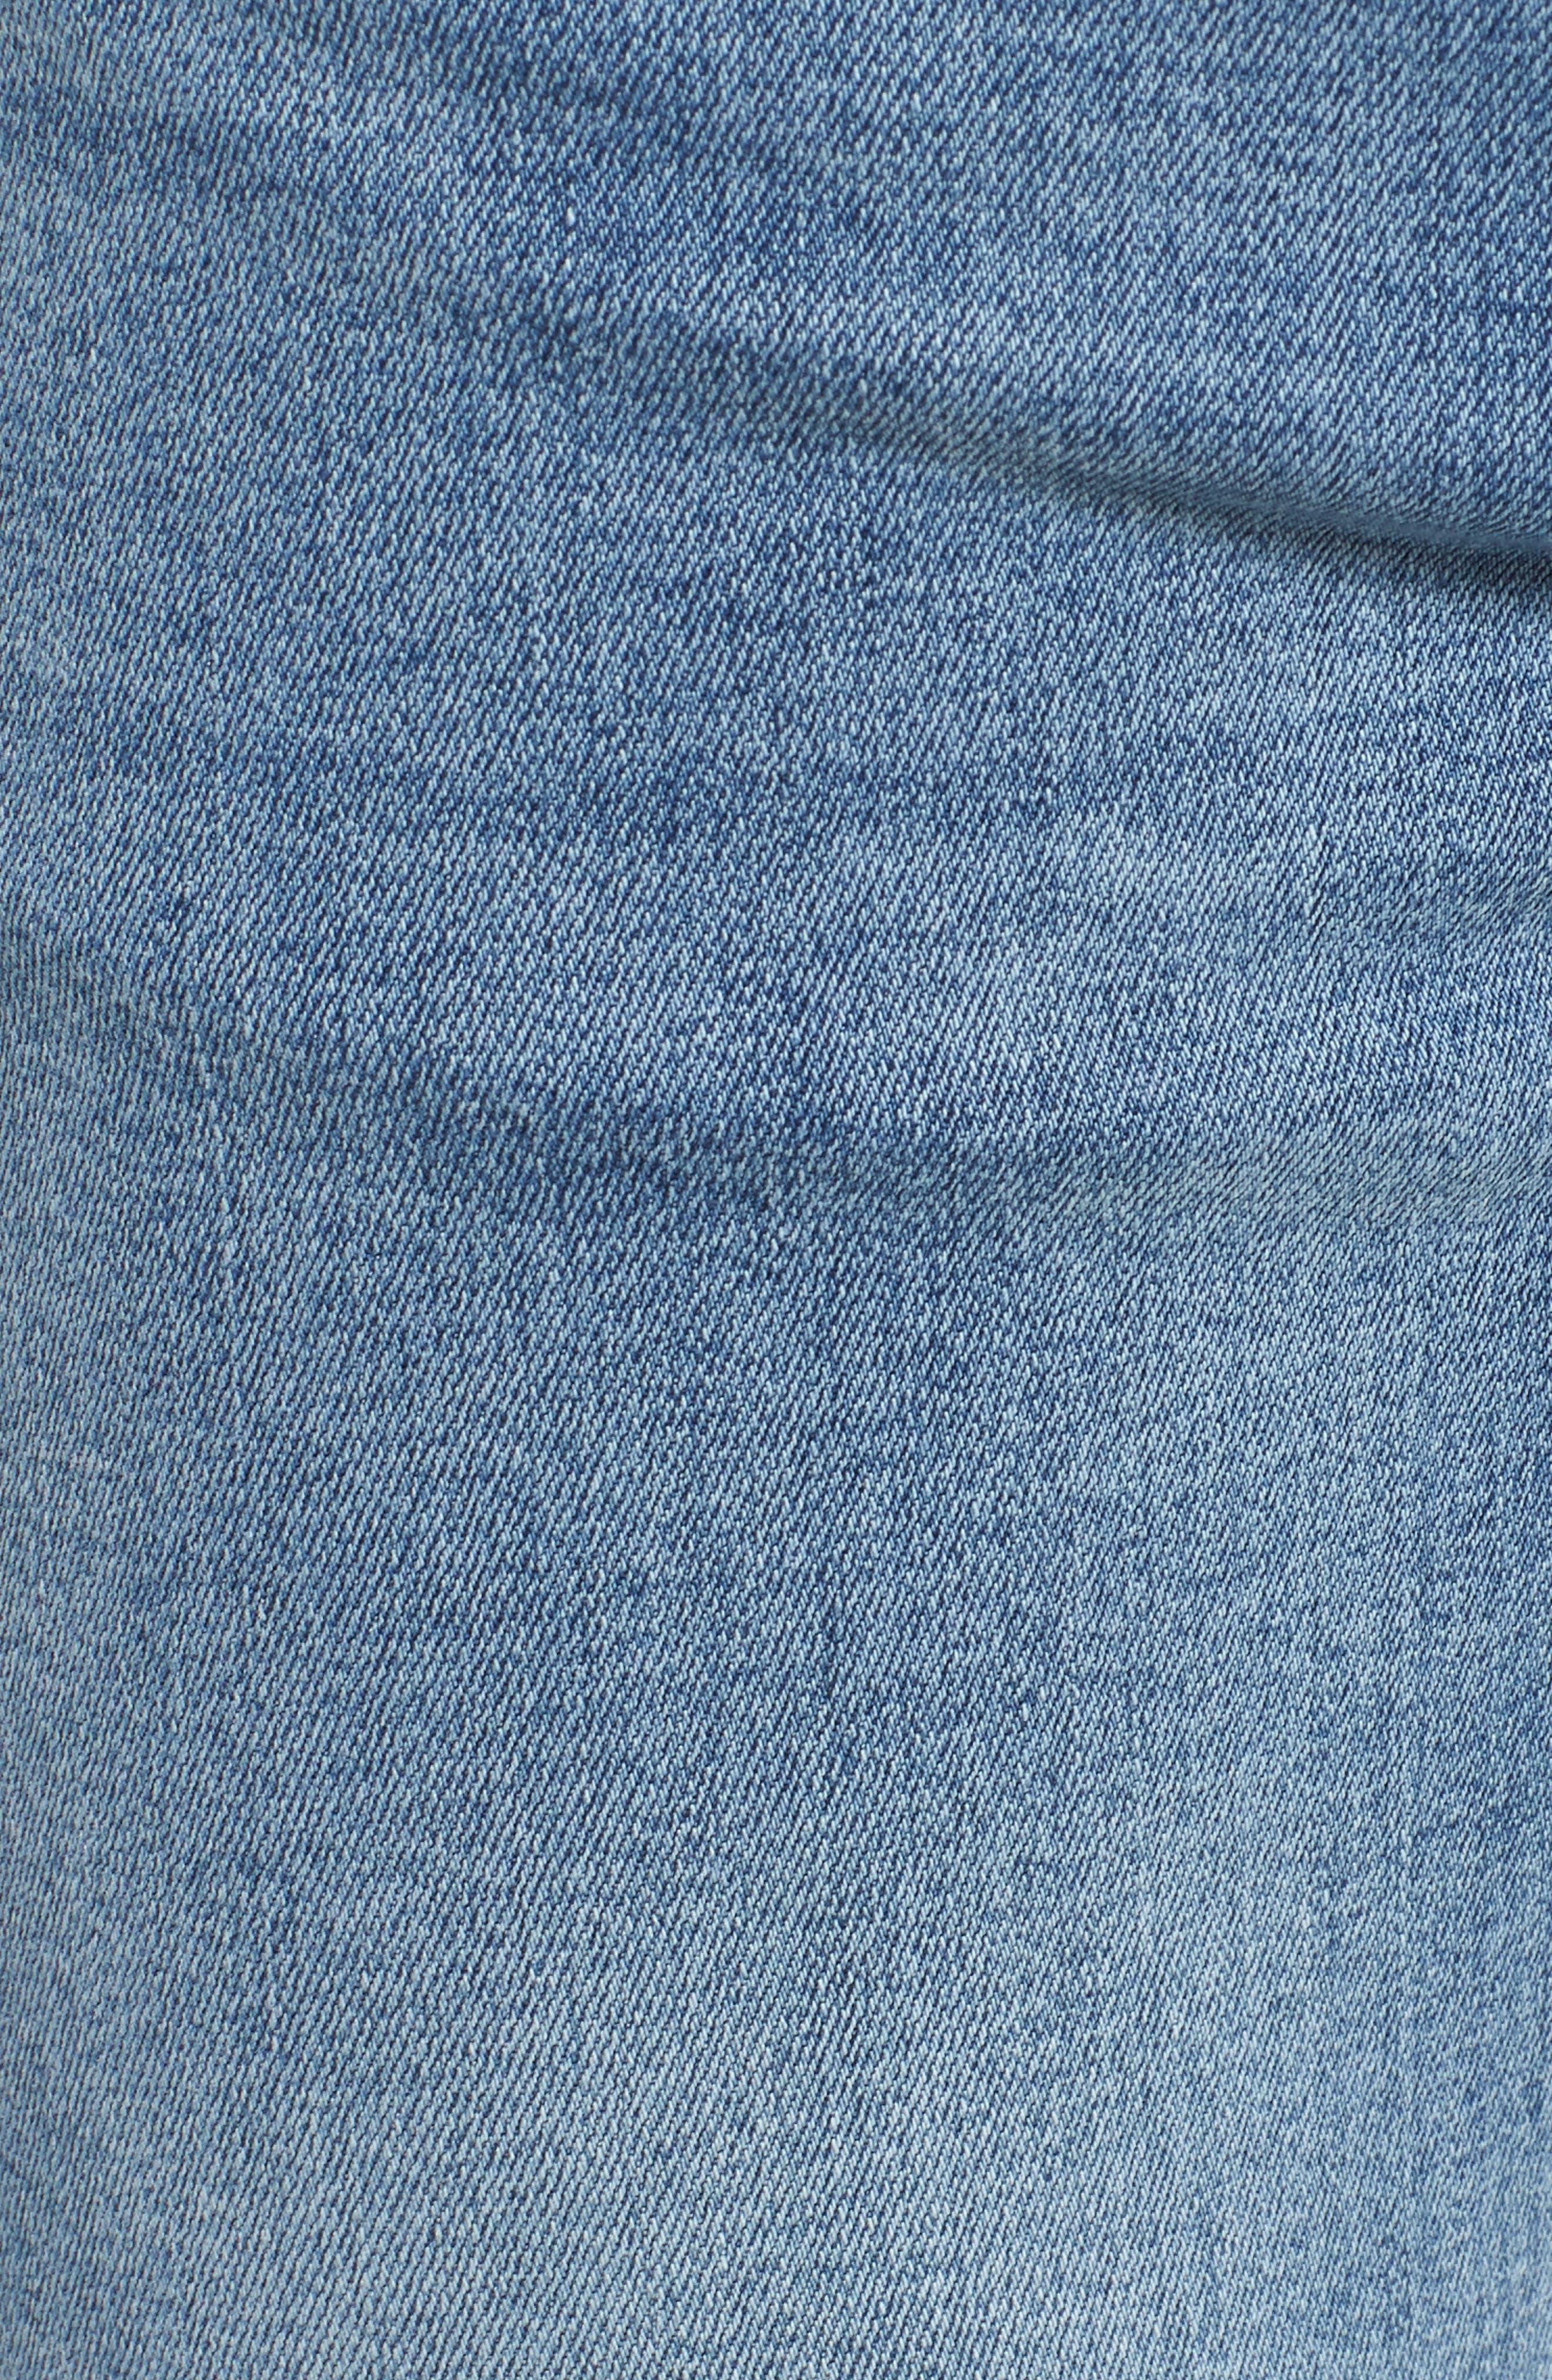 Snap Skinny Fit Jeans,                             Alternate thumbnail 5, color,                             Yonder Blue Wash